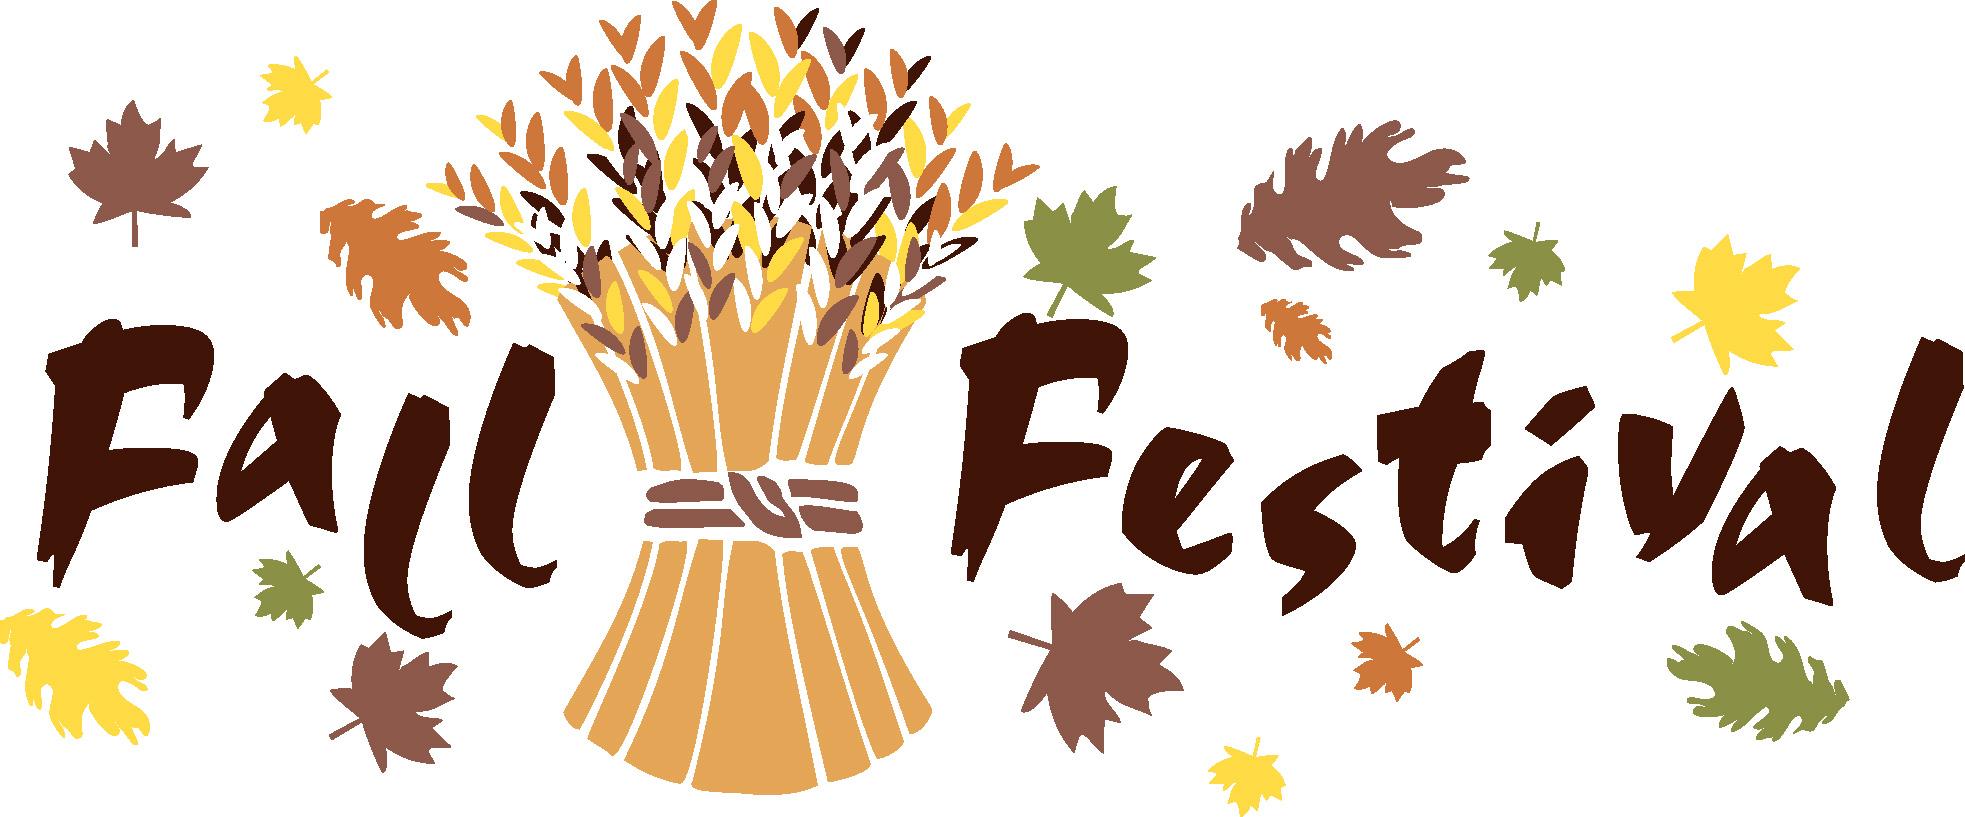 Clip Art Fall Festival Clipart fall festival clipart kid fallfest